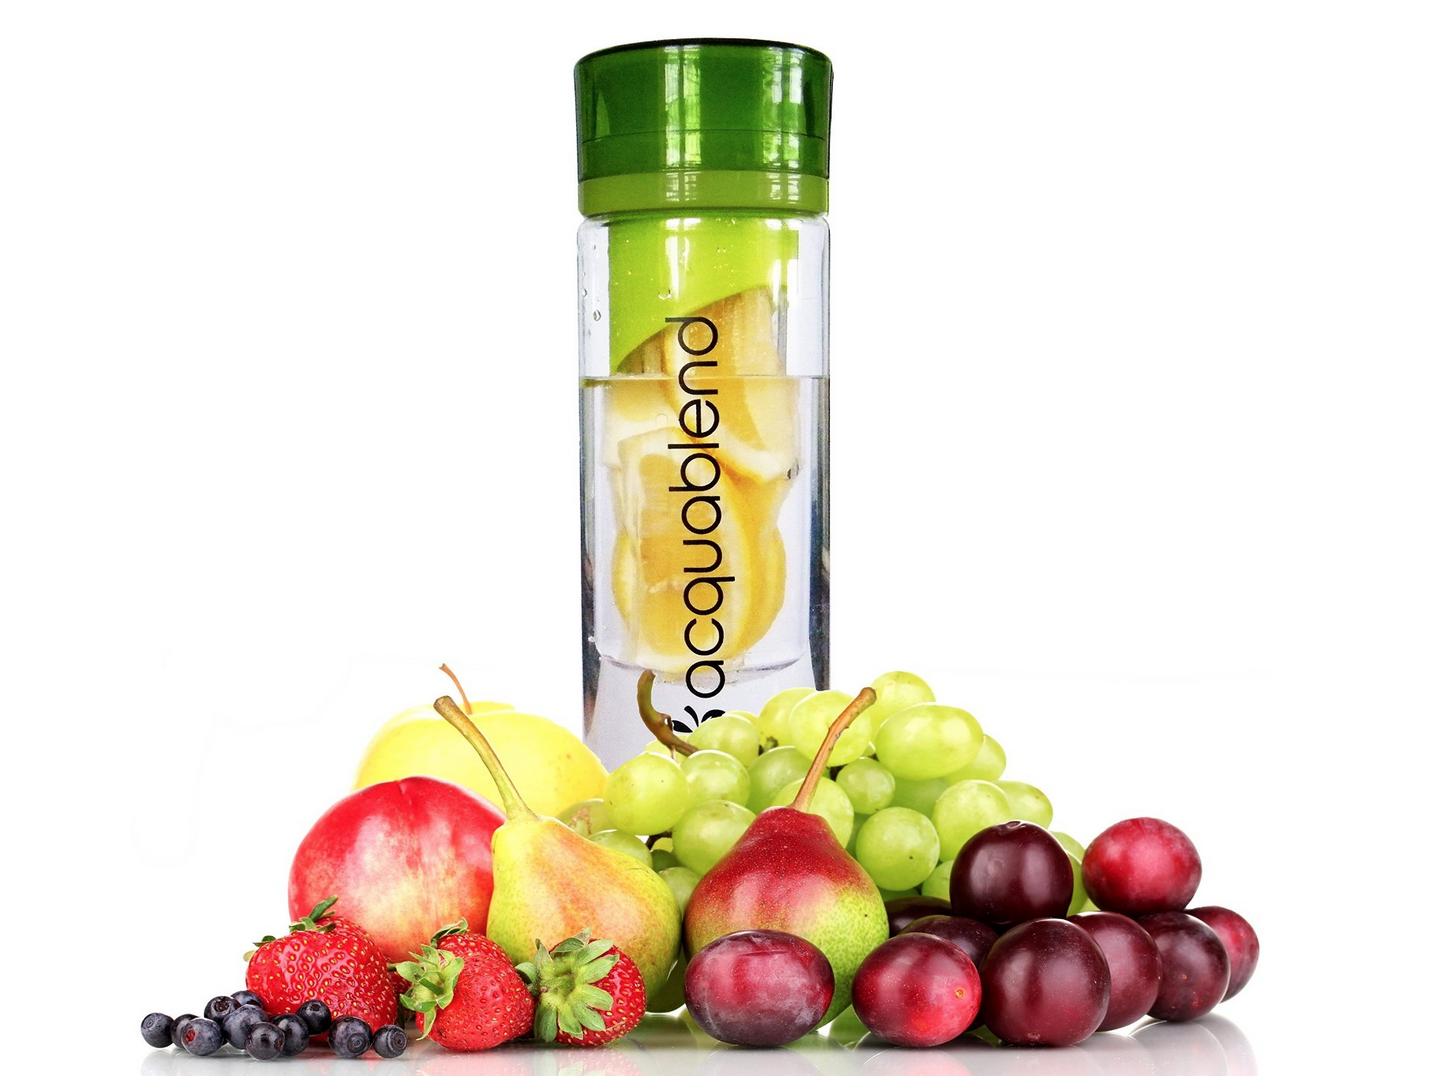 24 Oz. Premium Fruit Infuser Water Bottle Only $17.99 (Reg. $35.99!)